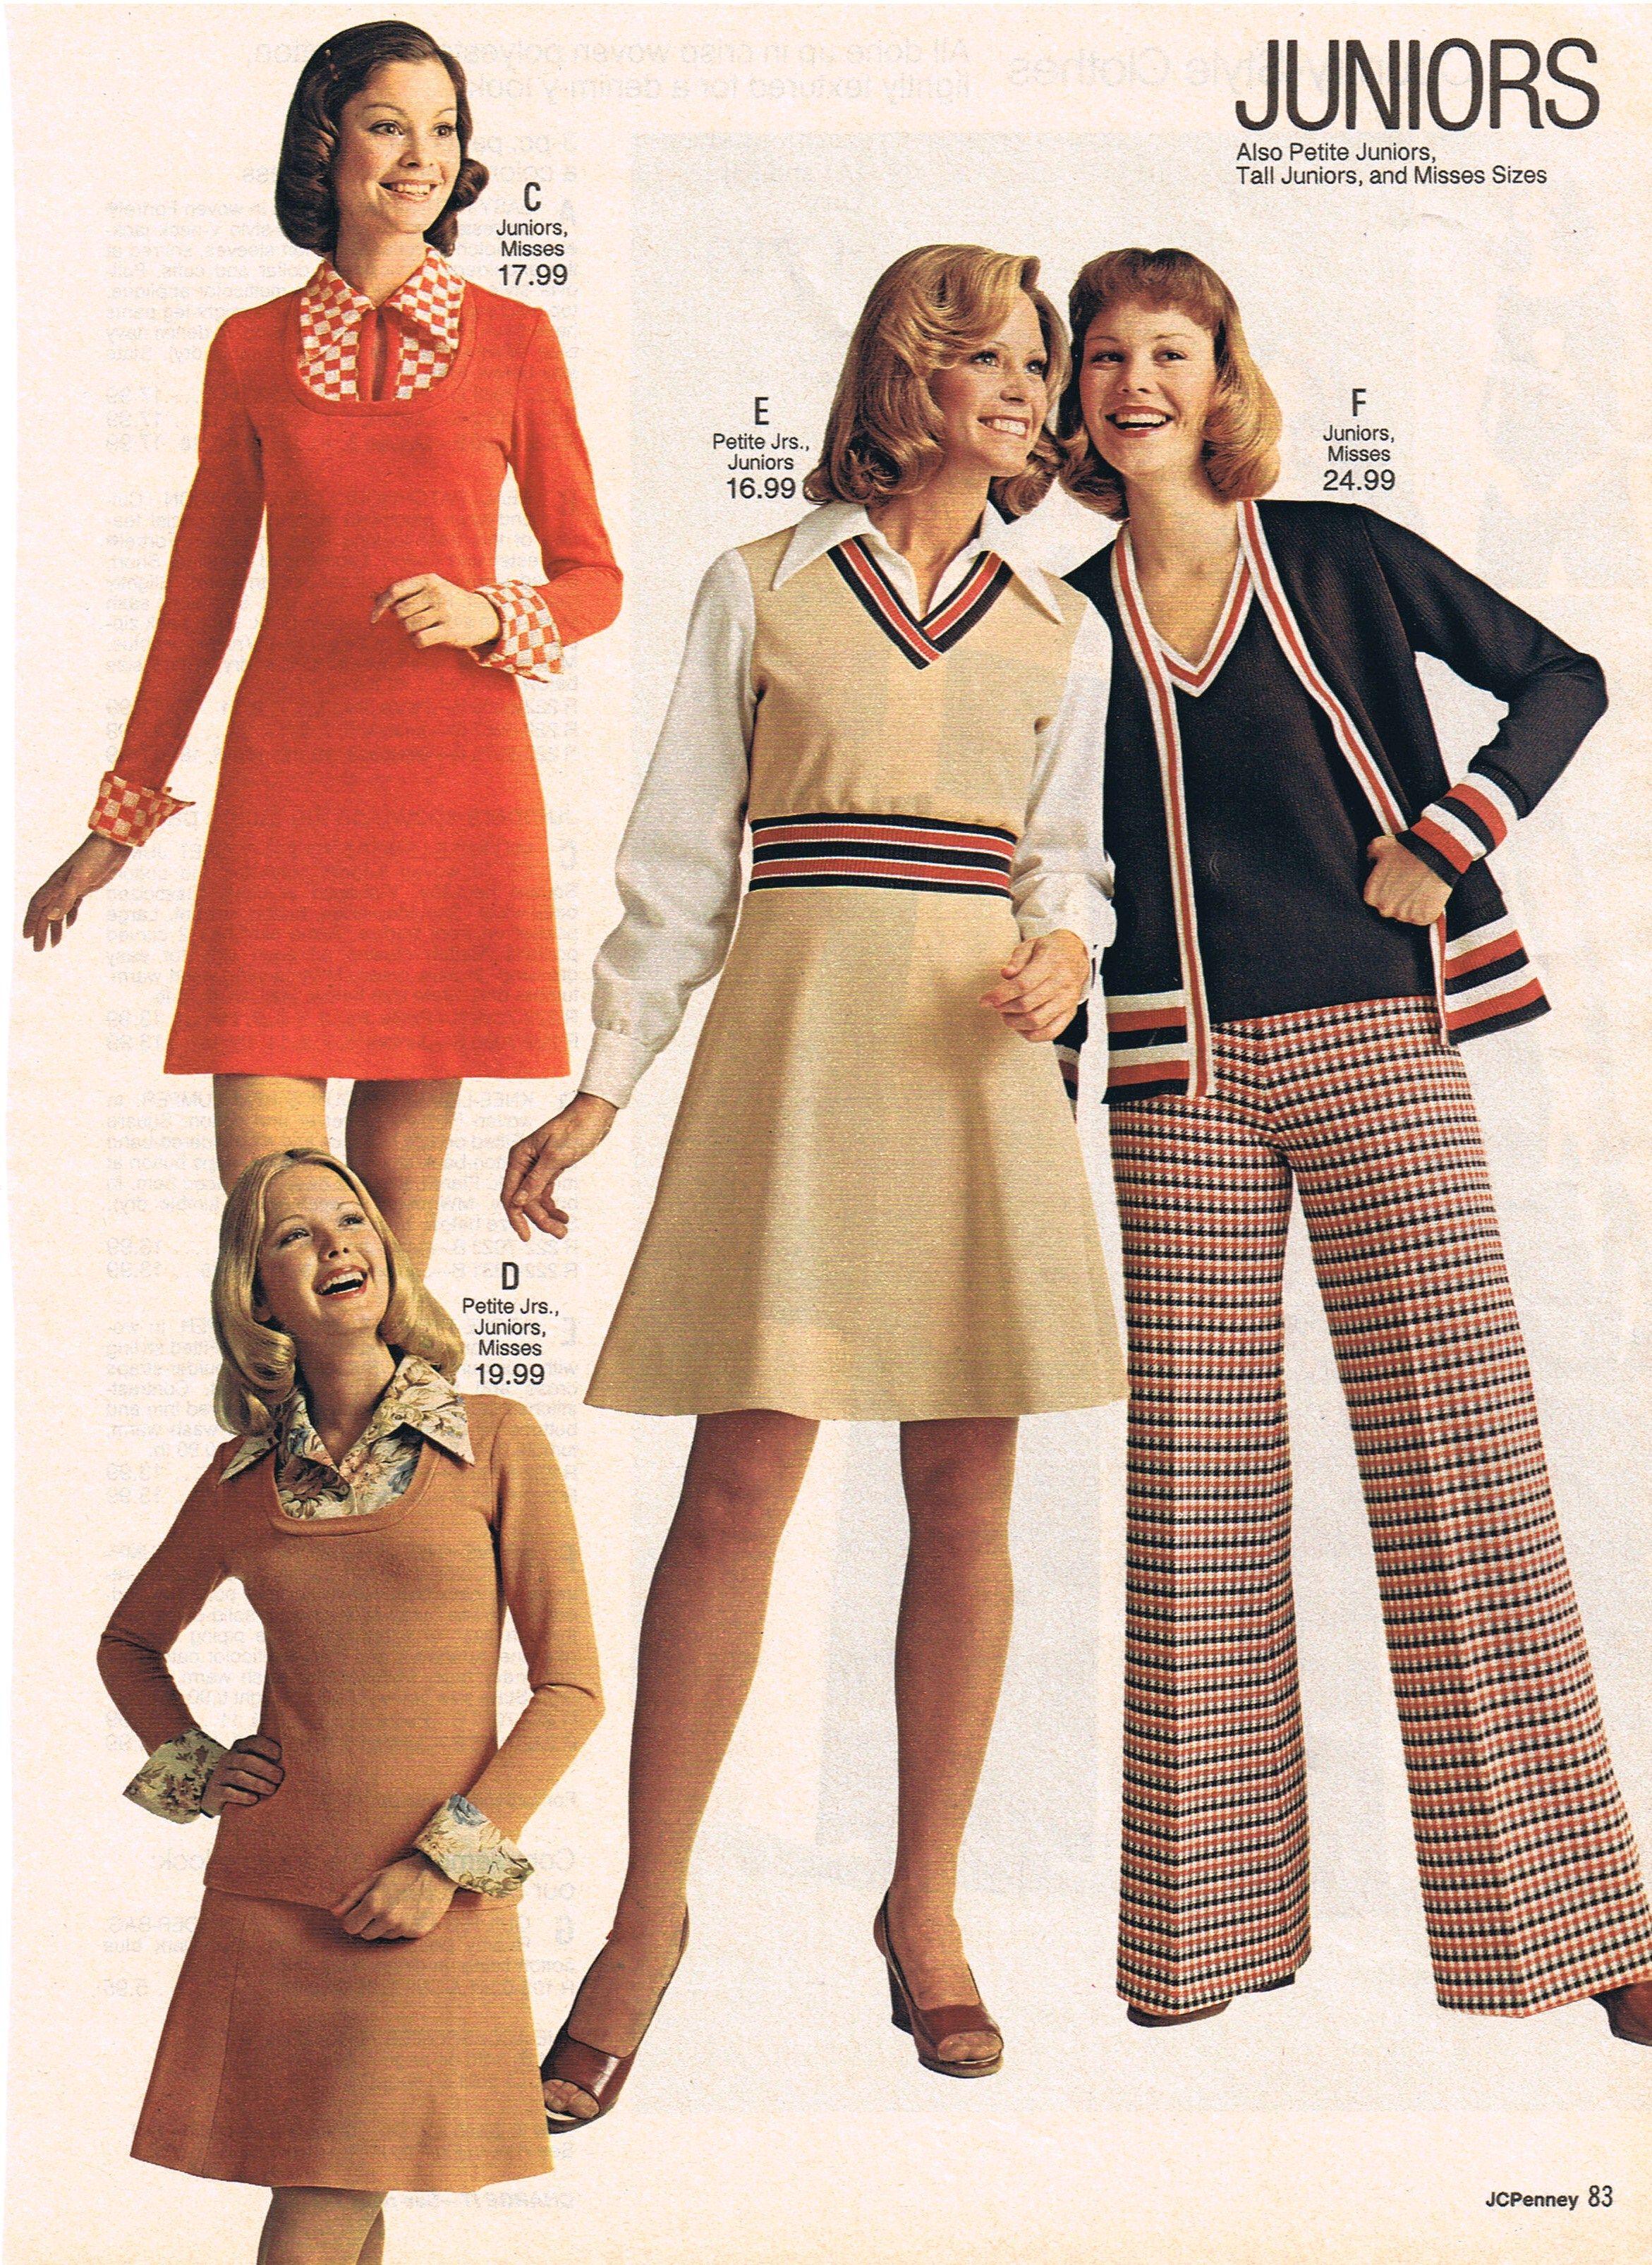 Classic teen clothing